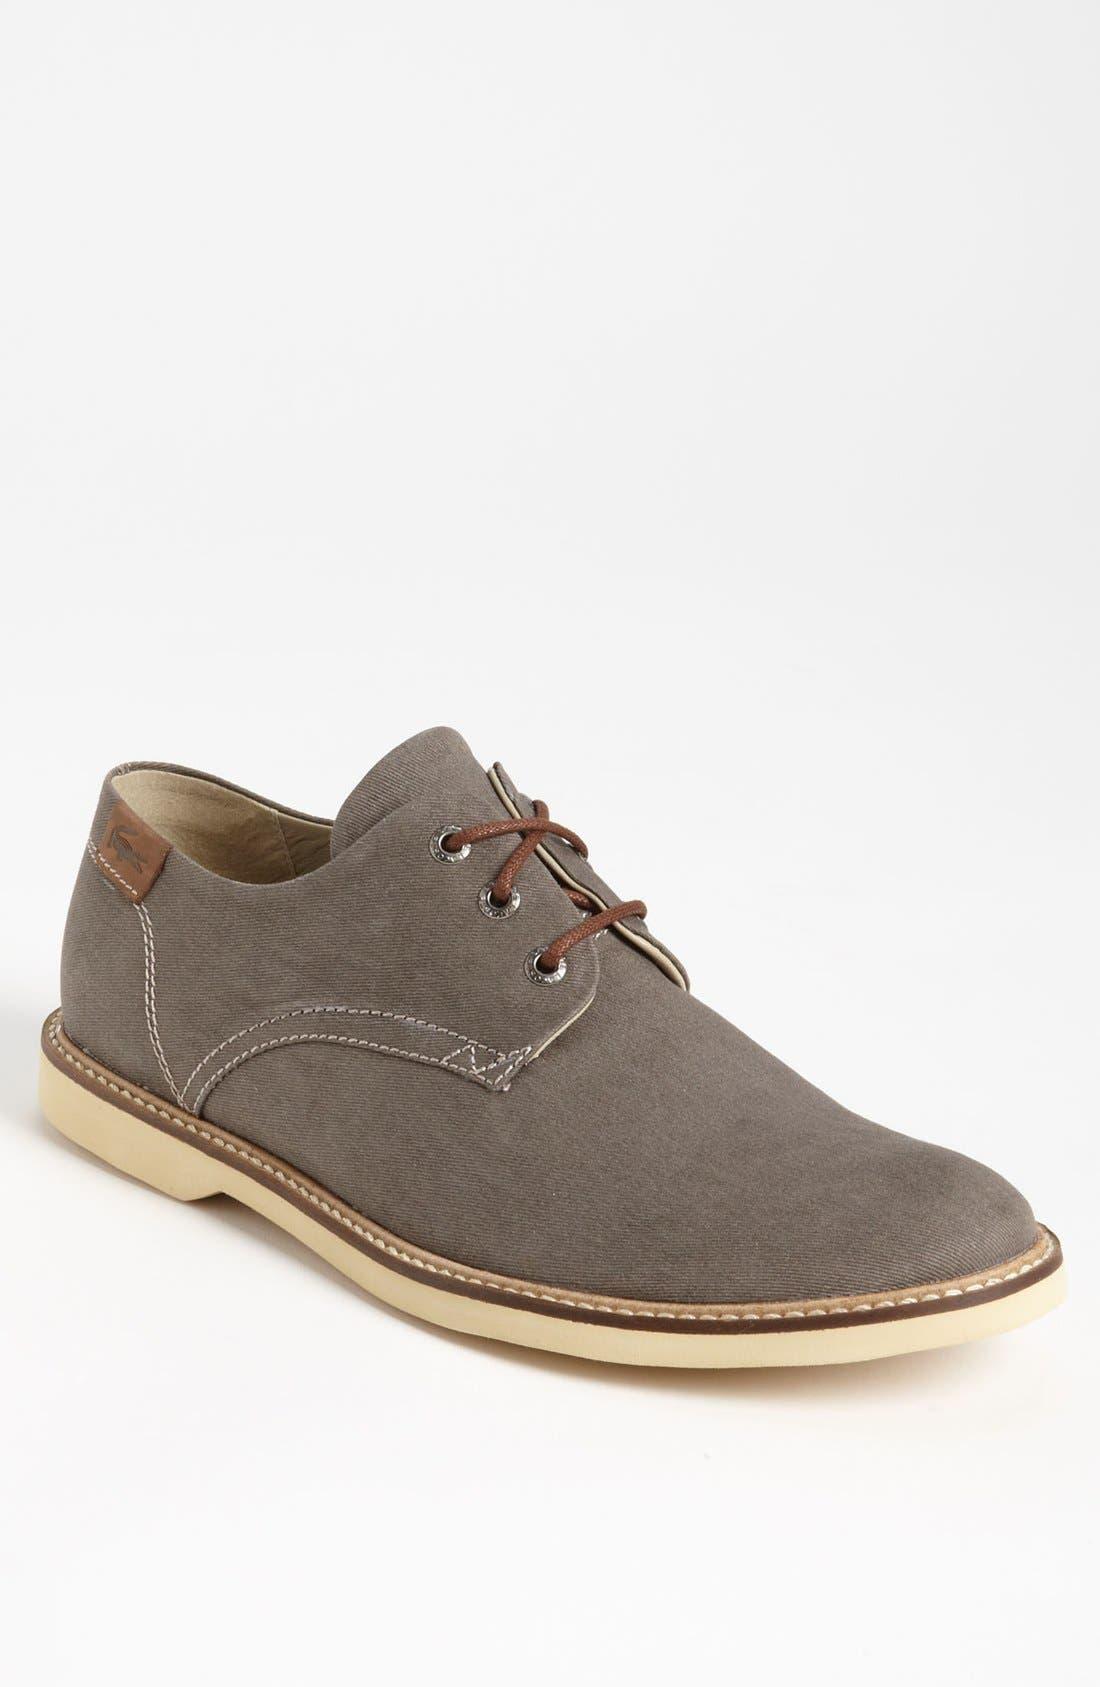 Main Image - Lacoste 'Sherbrooke 7' Twill Buck Shoe